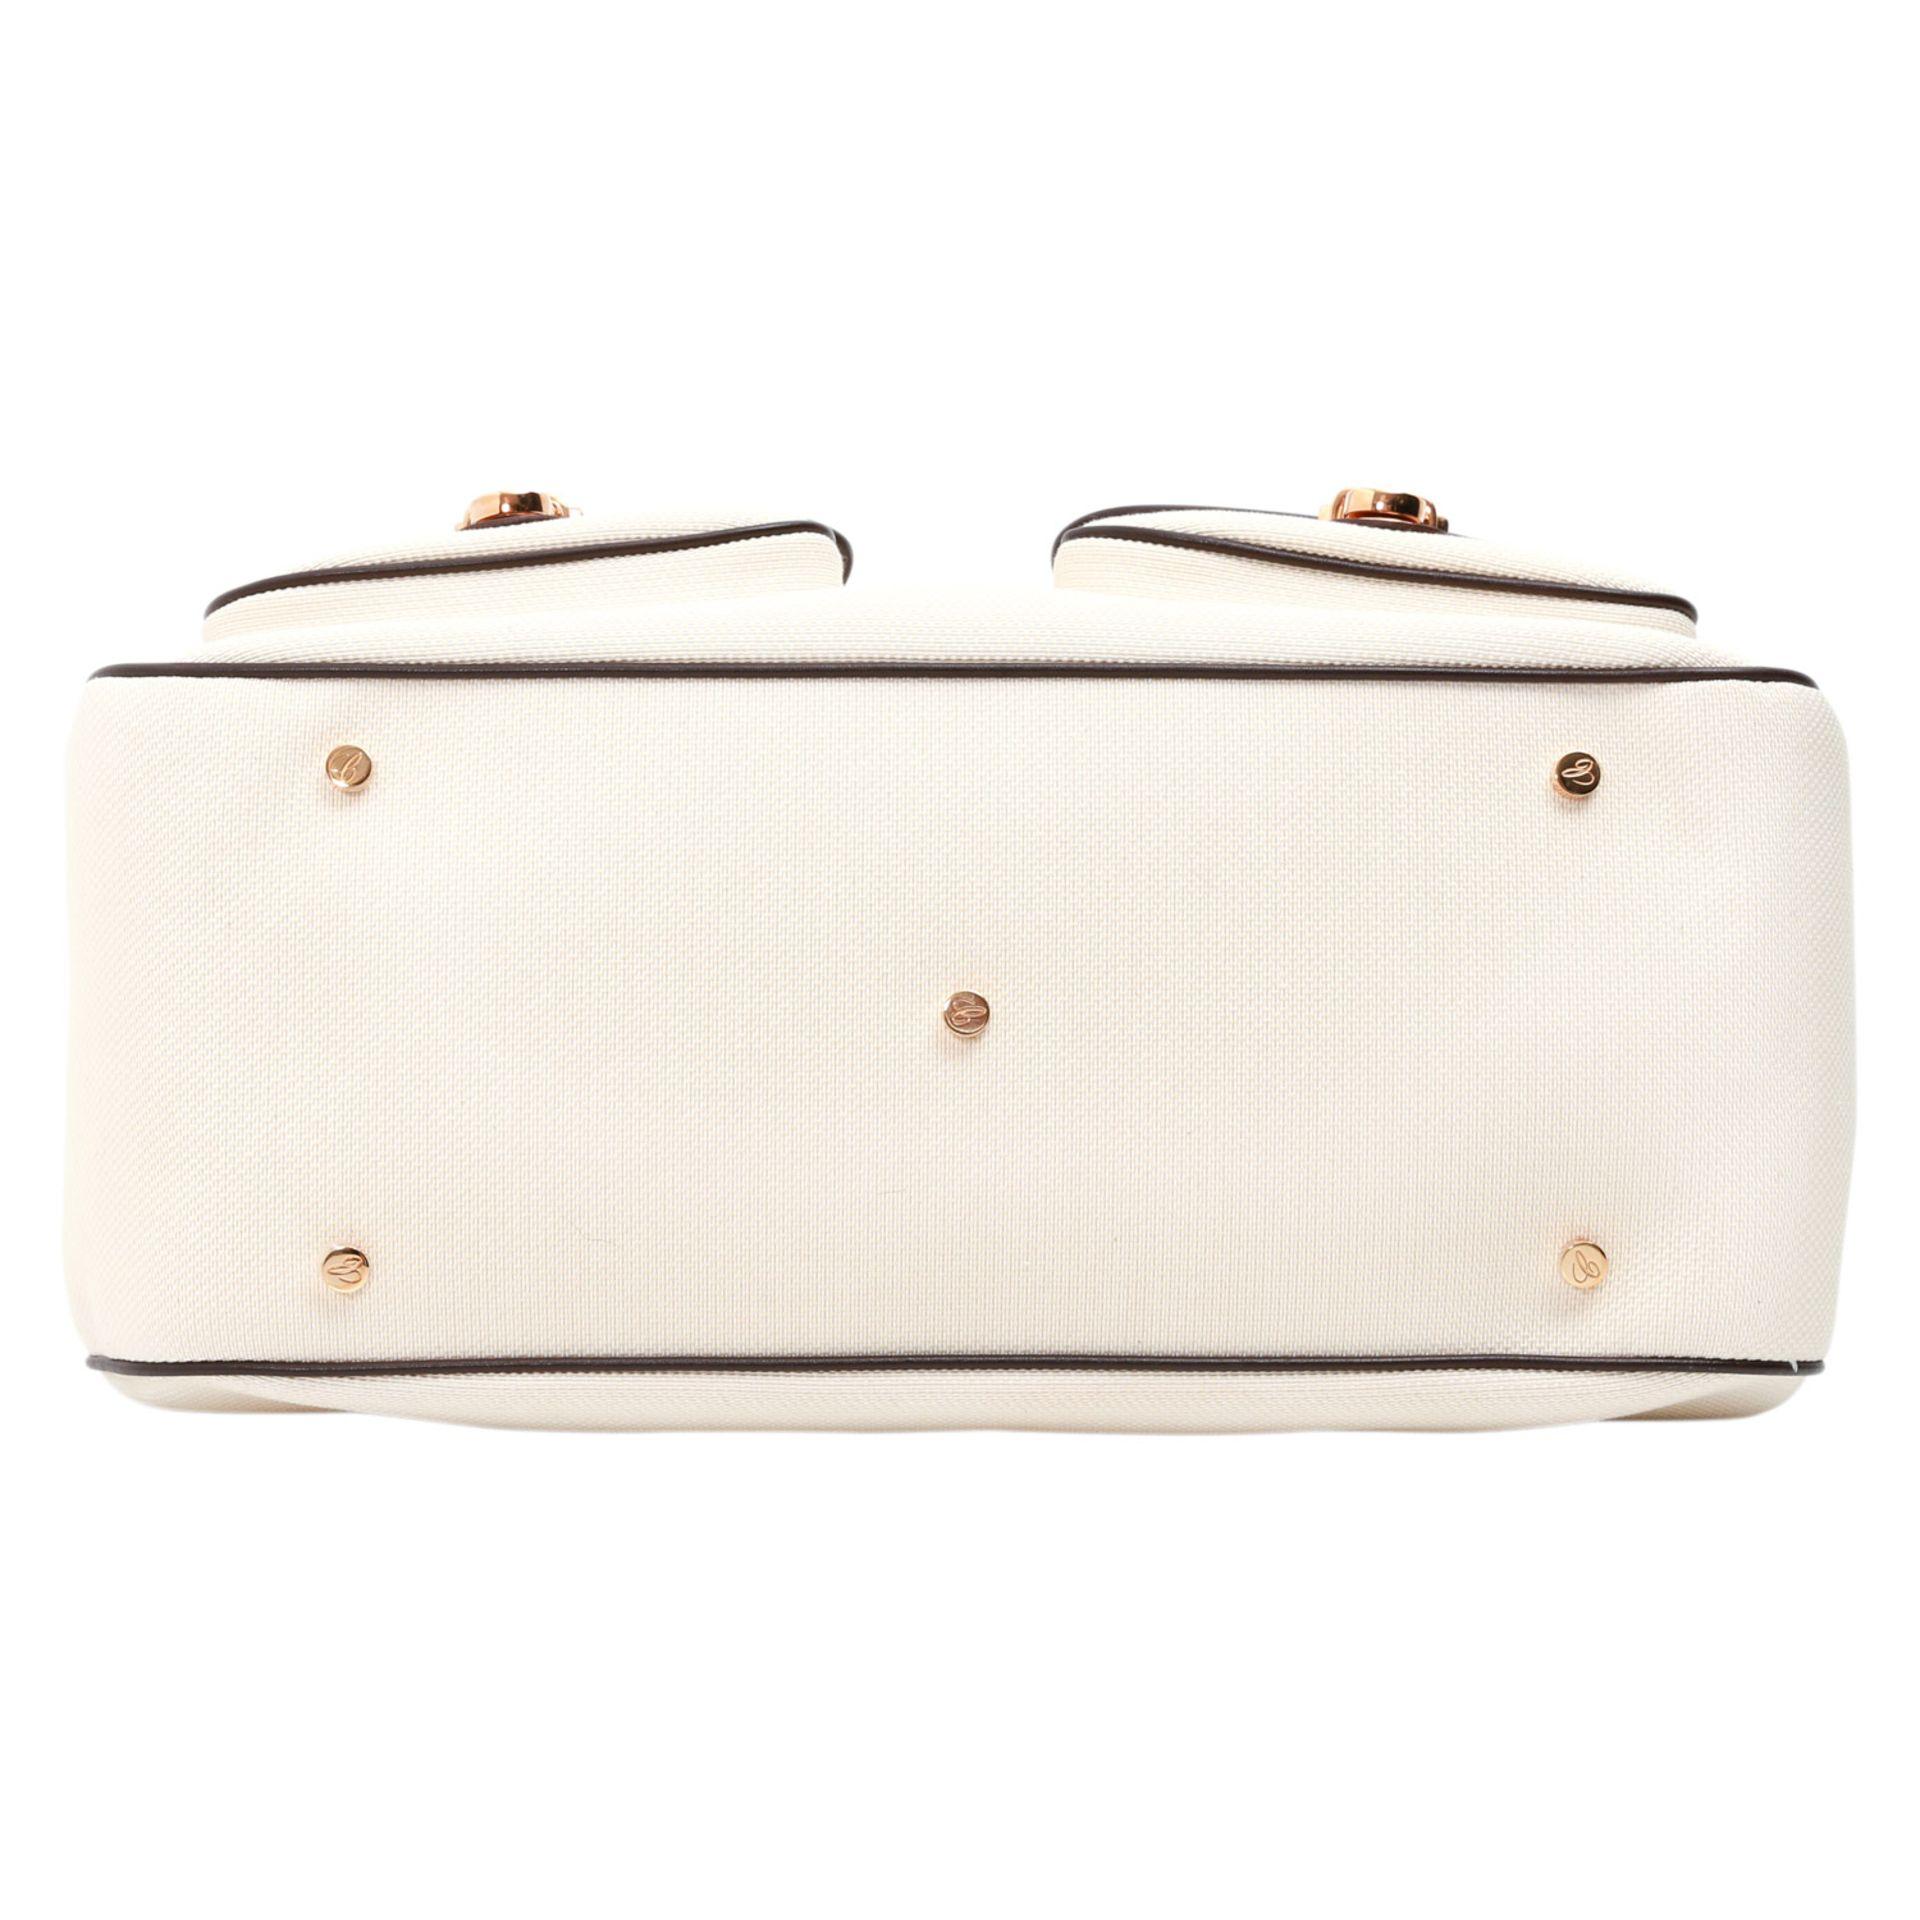 CHOPARD GENÈVE Henkeltasche. Bowlingbagform aus perlweißem Textil, bordeauxfarbene Lederdetails - Bild 10 aus 14